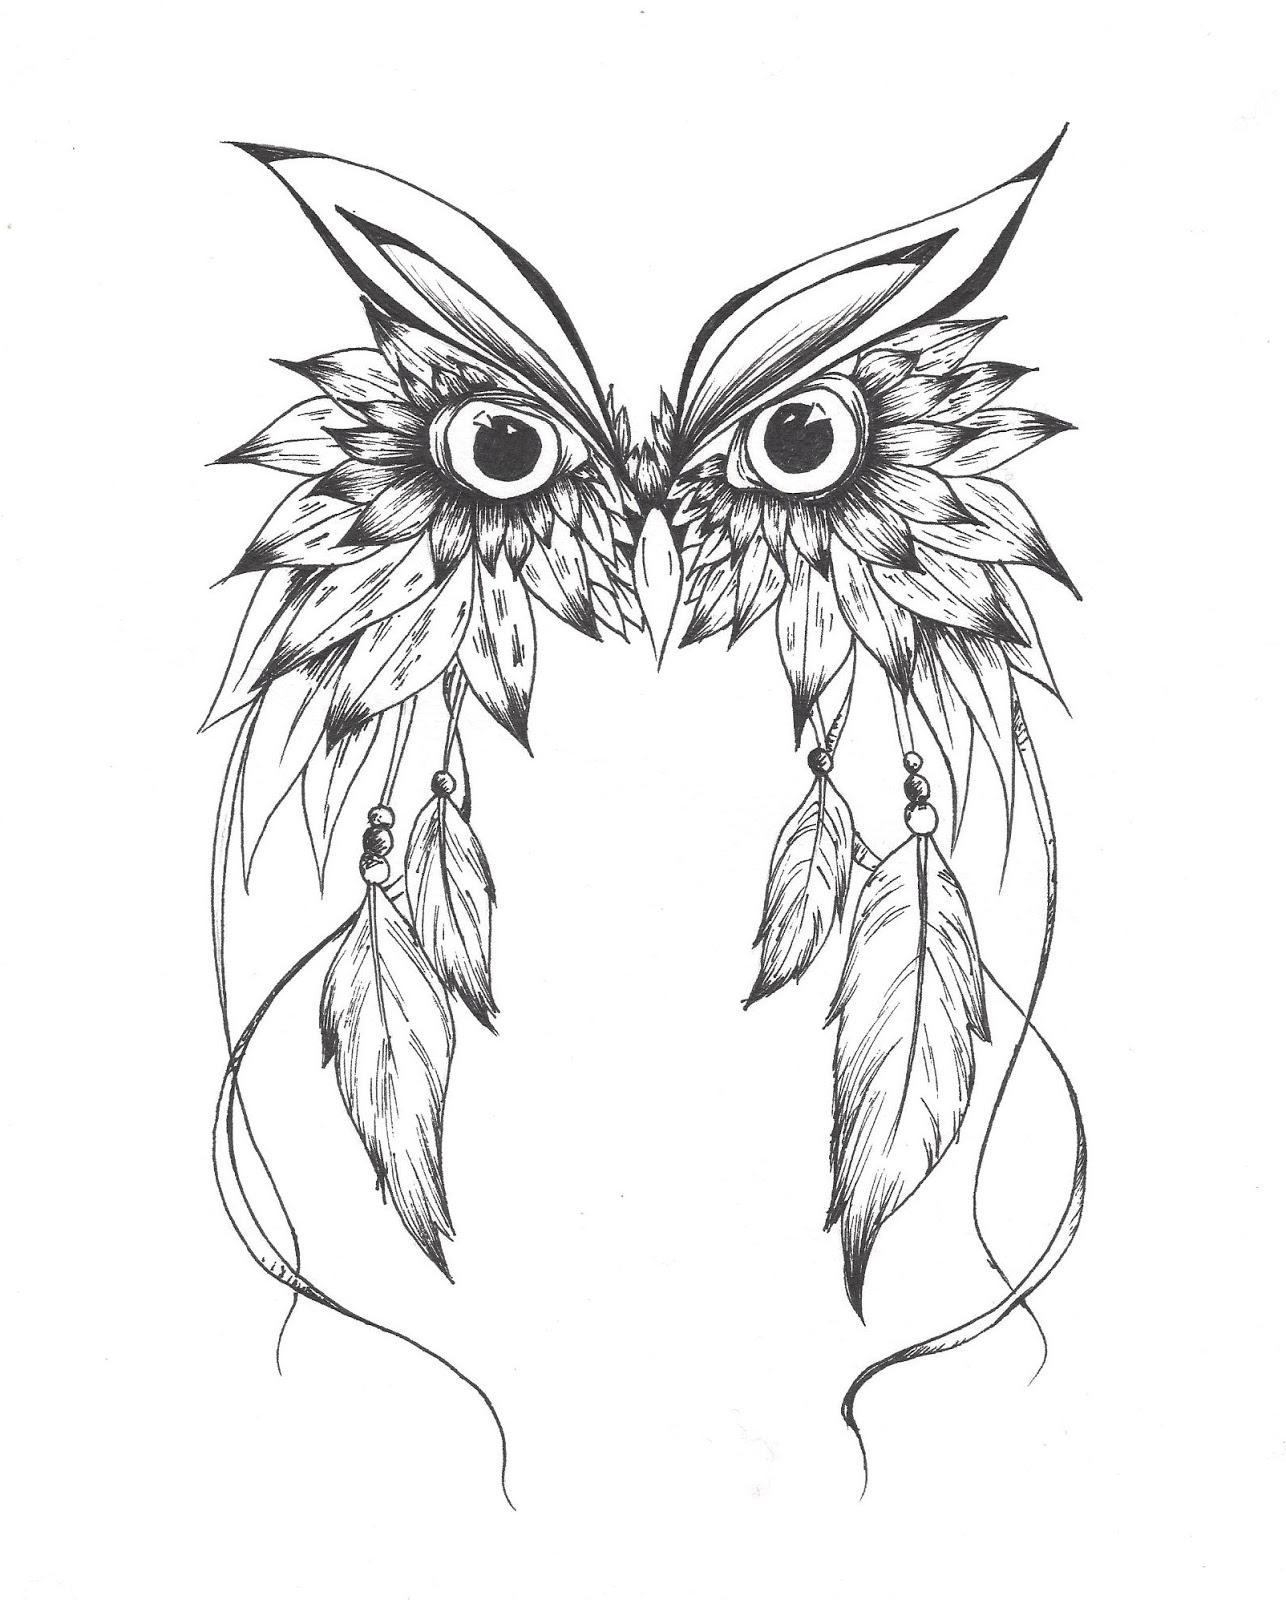 Owl dreamcatcher drawing - photo#33